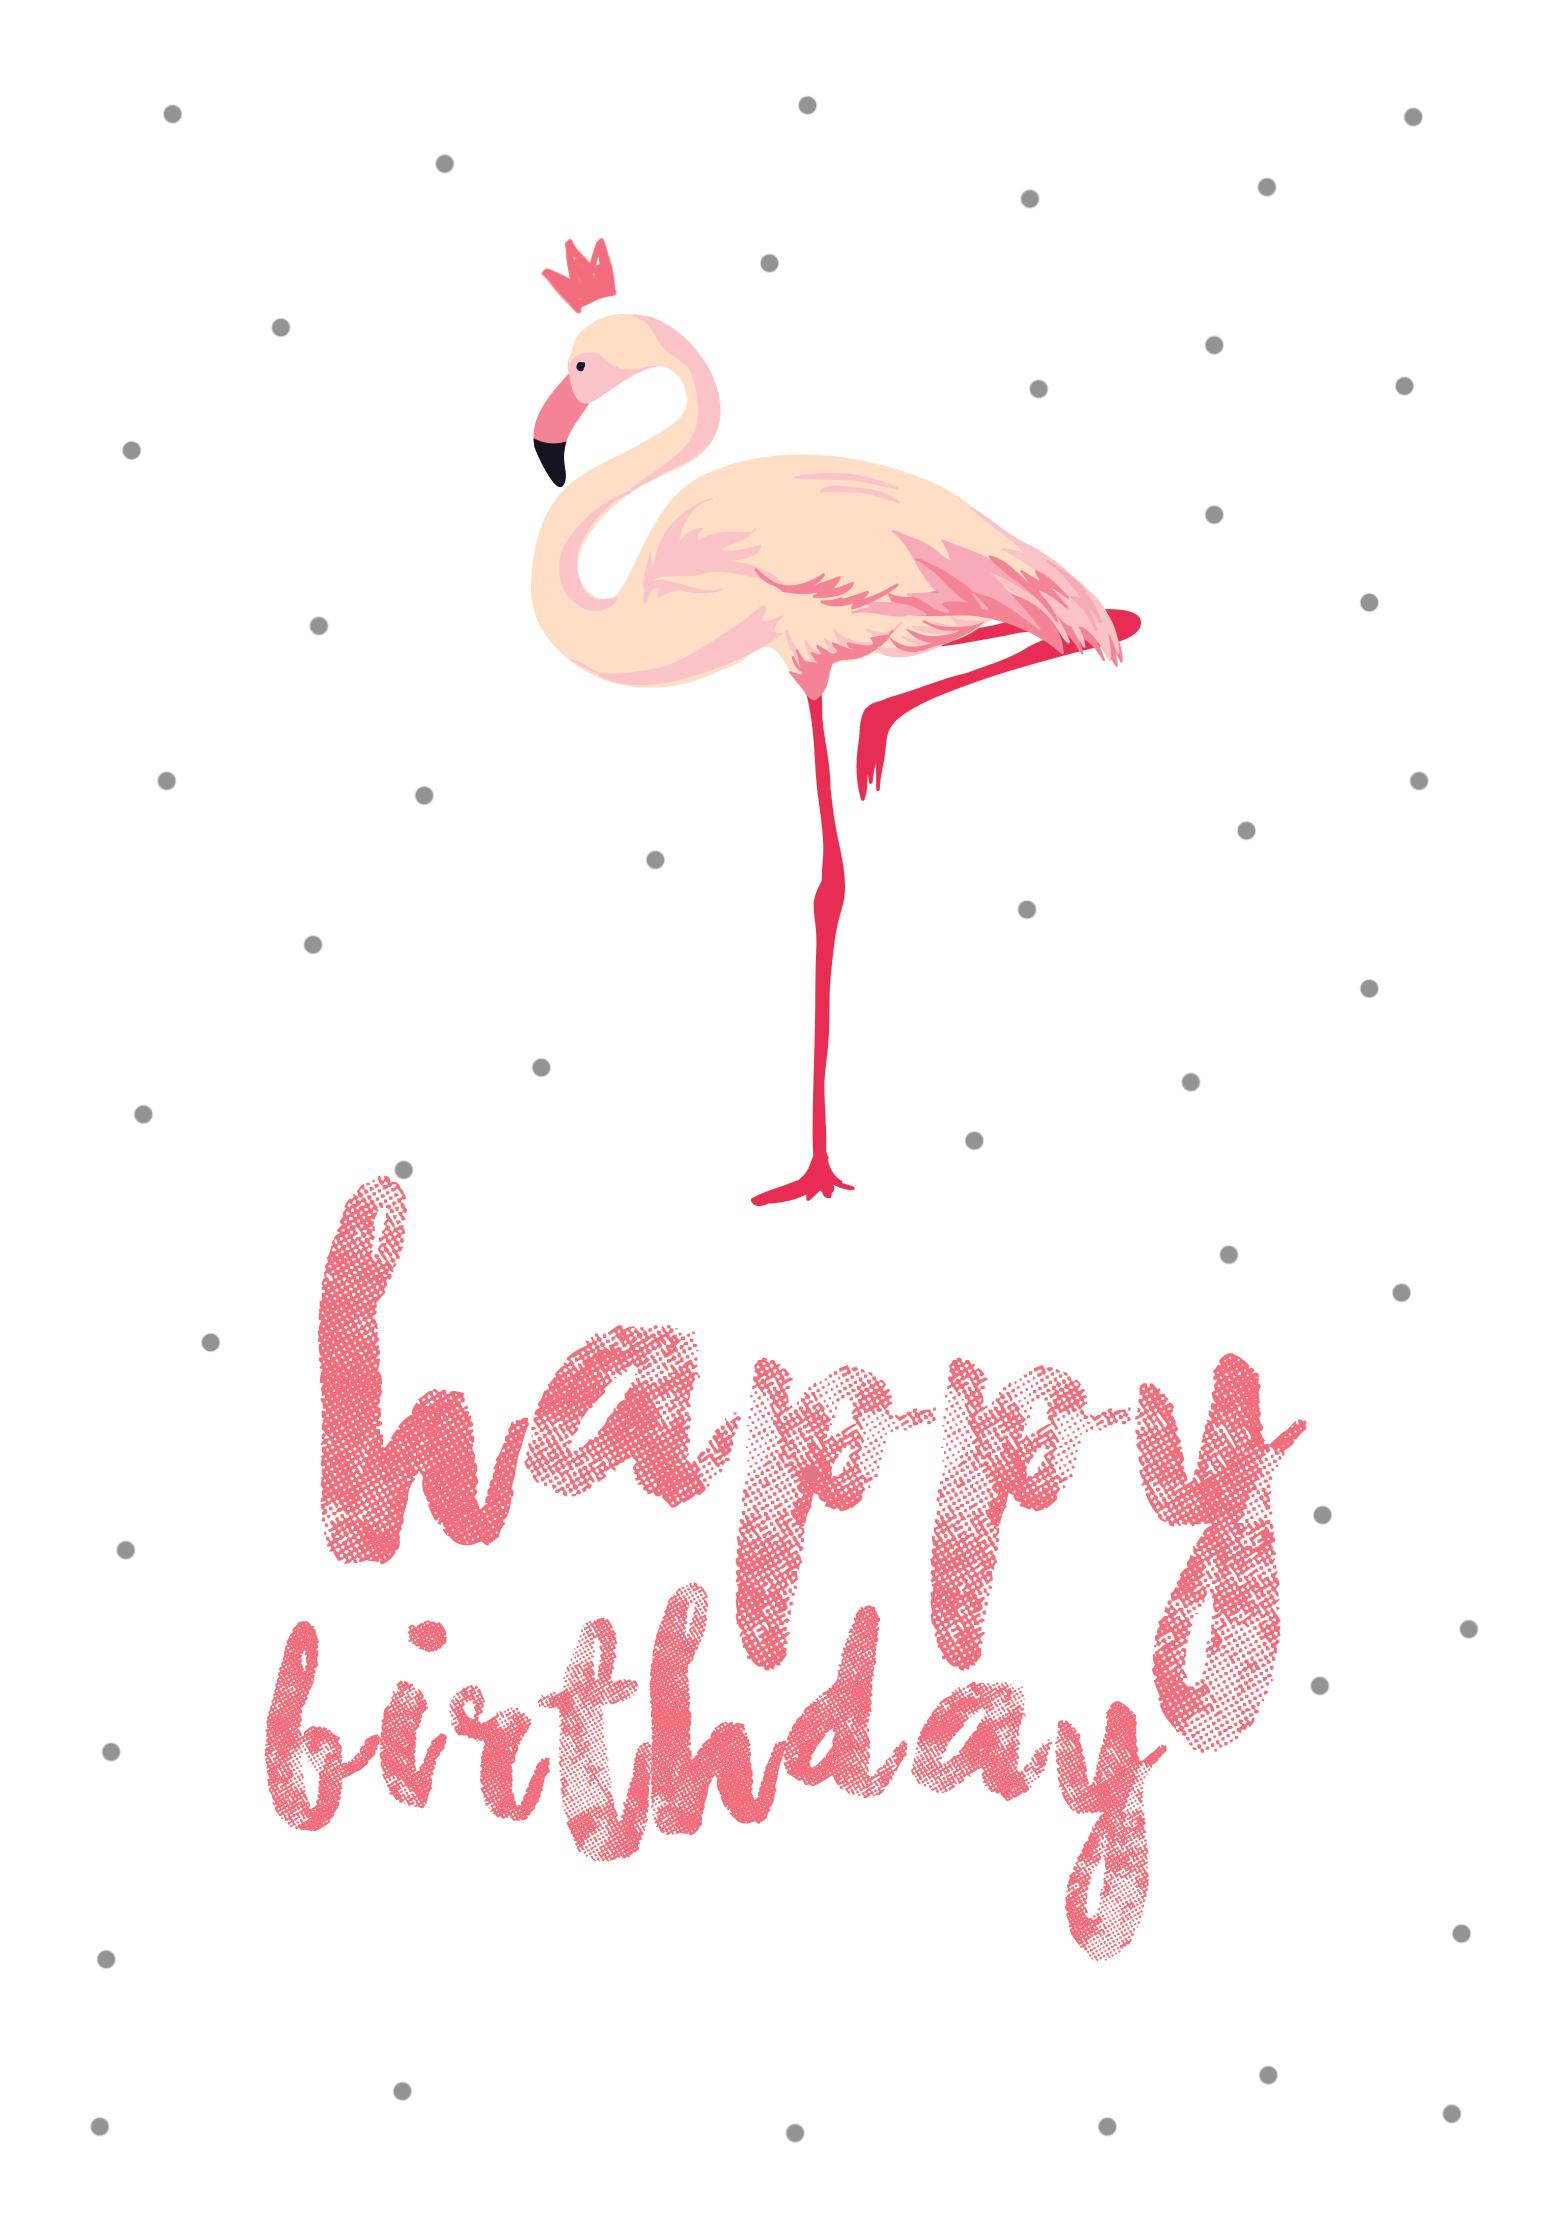 Flamingo Birthday - Free Printable Birthday Card   Greetings Island - Free Printable Greeting Cards No Sign Up